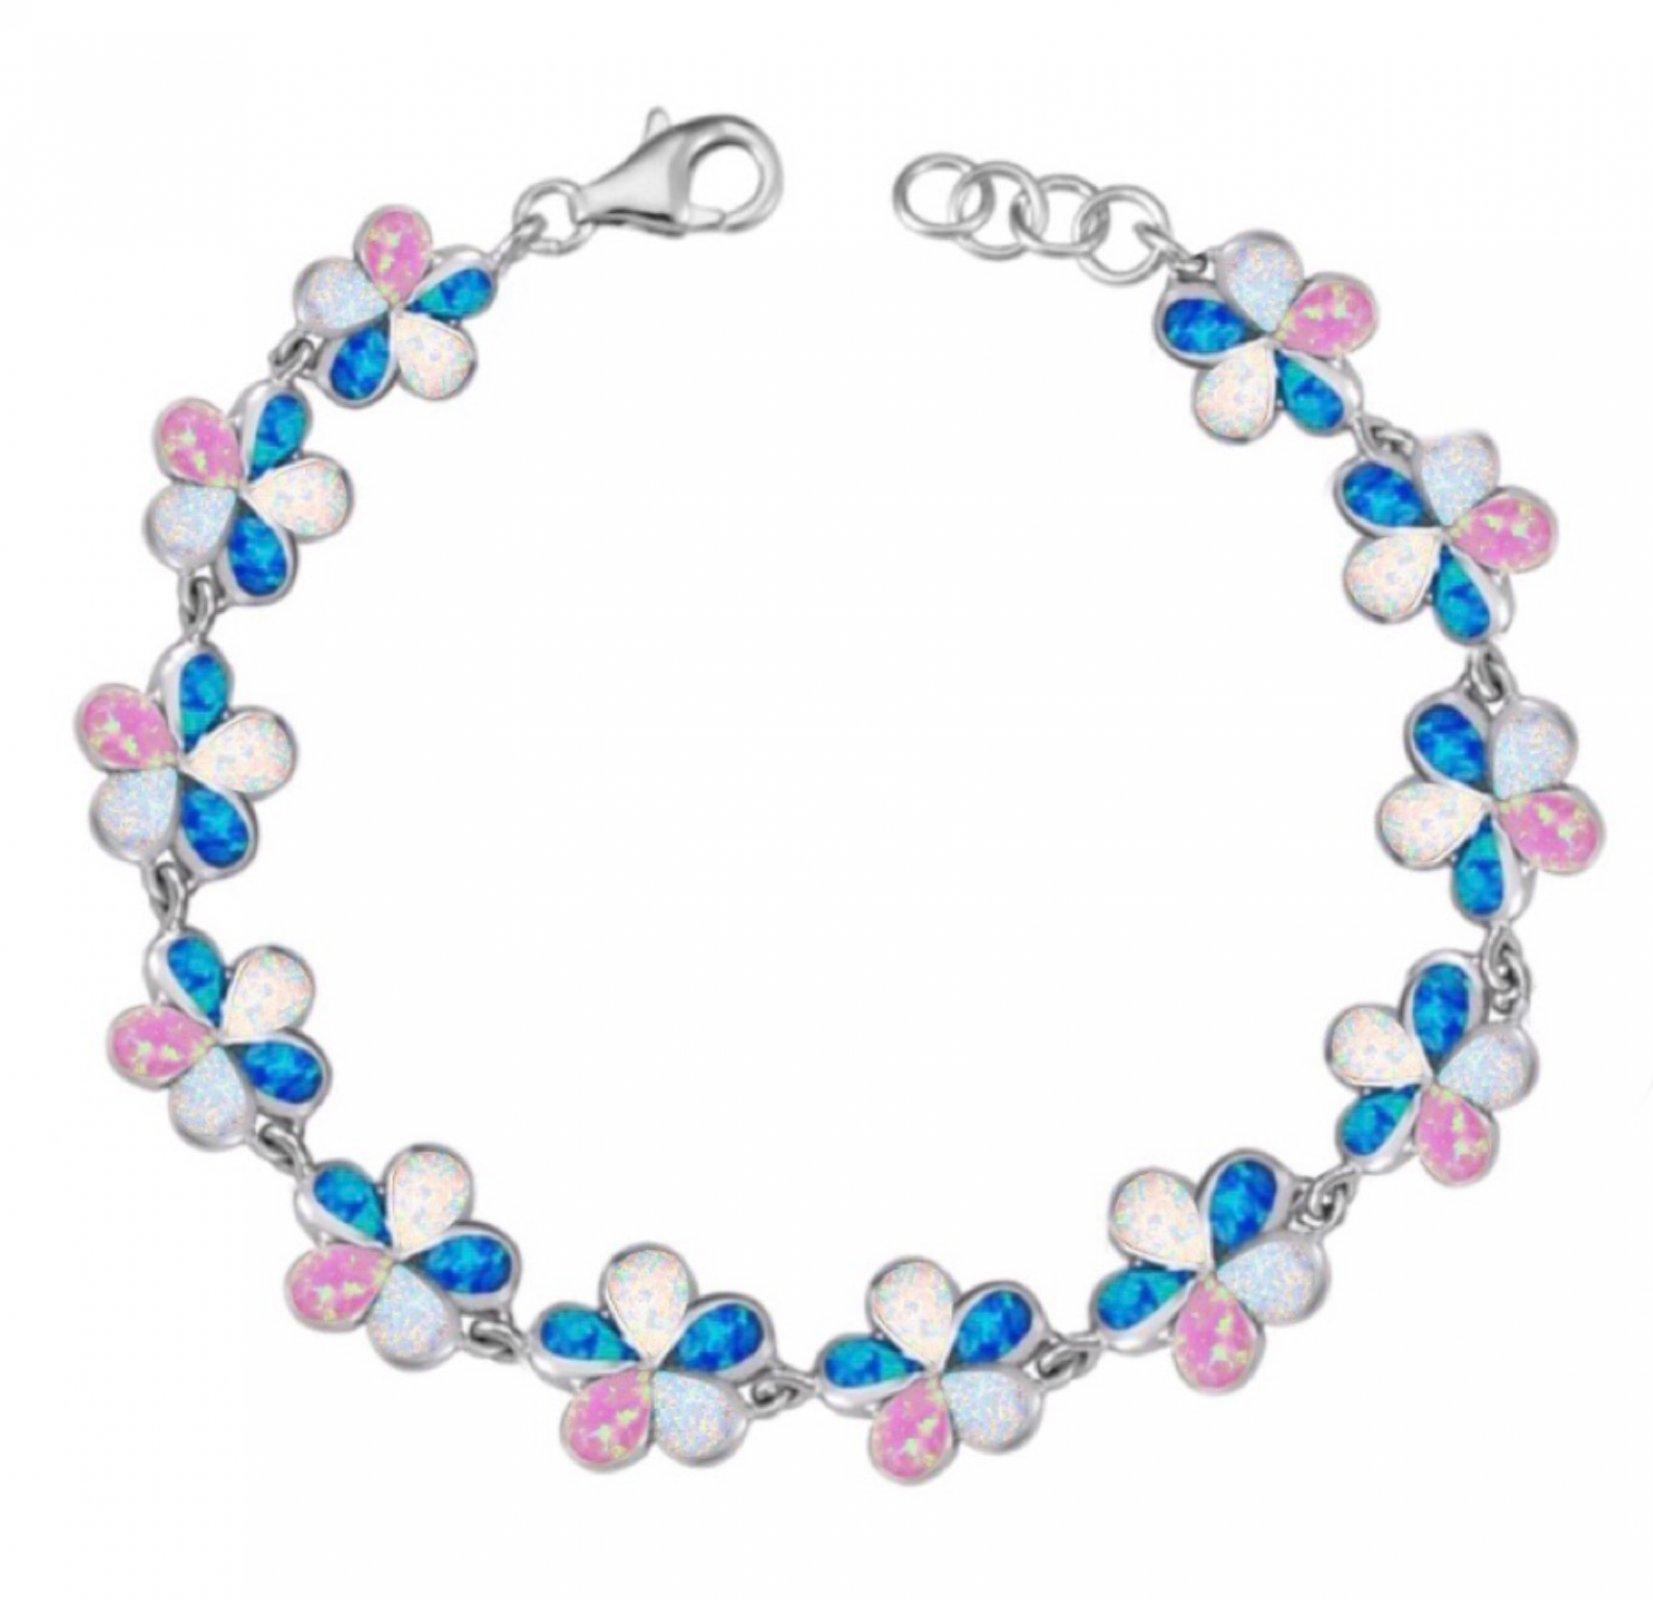 Opal Plumeria Flower Bracelet - Tri-Color